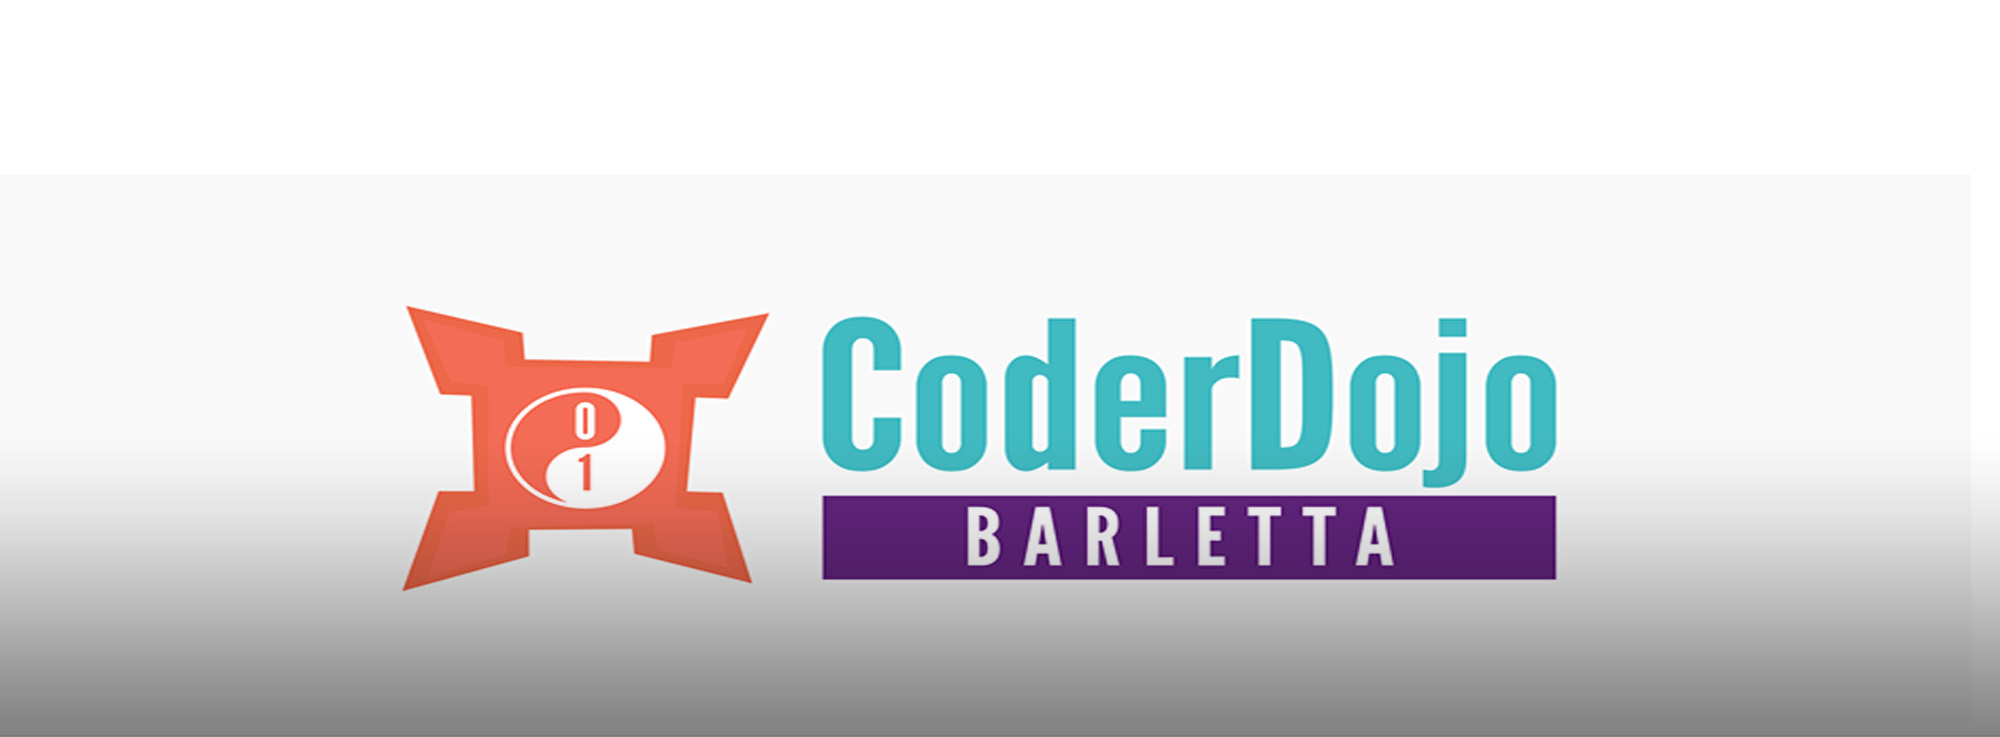 Barletta: CoderDojo